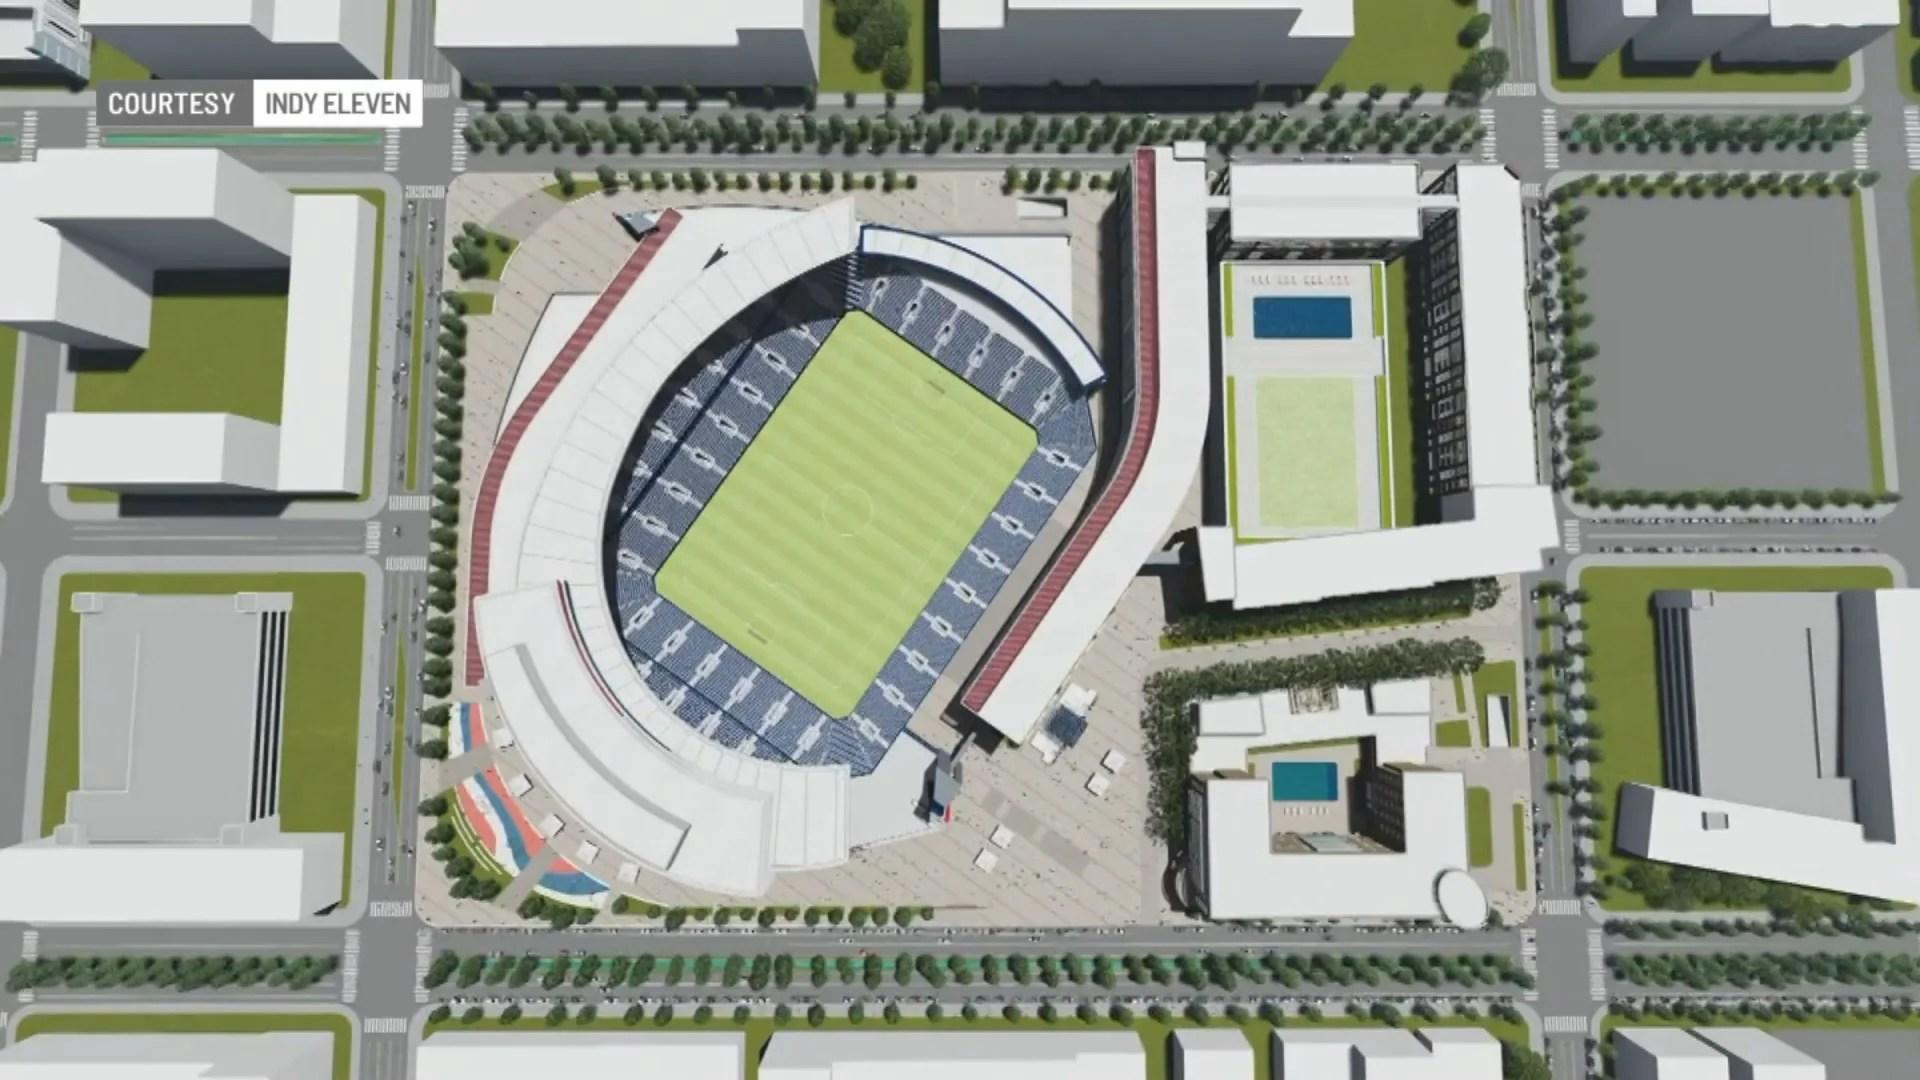 Indy Eleven stadium proposal